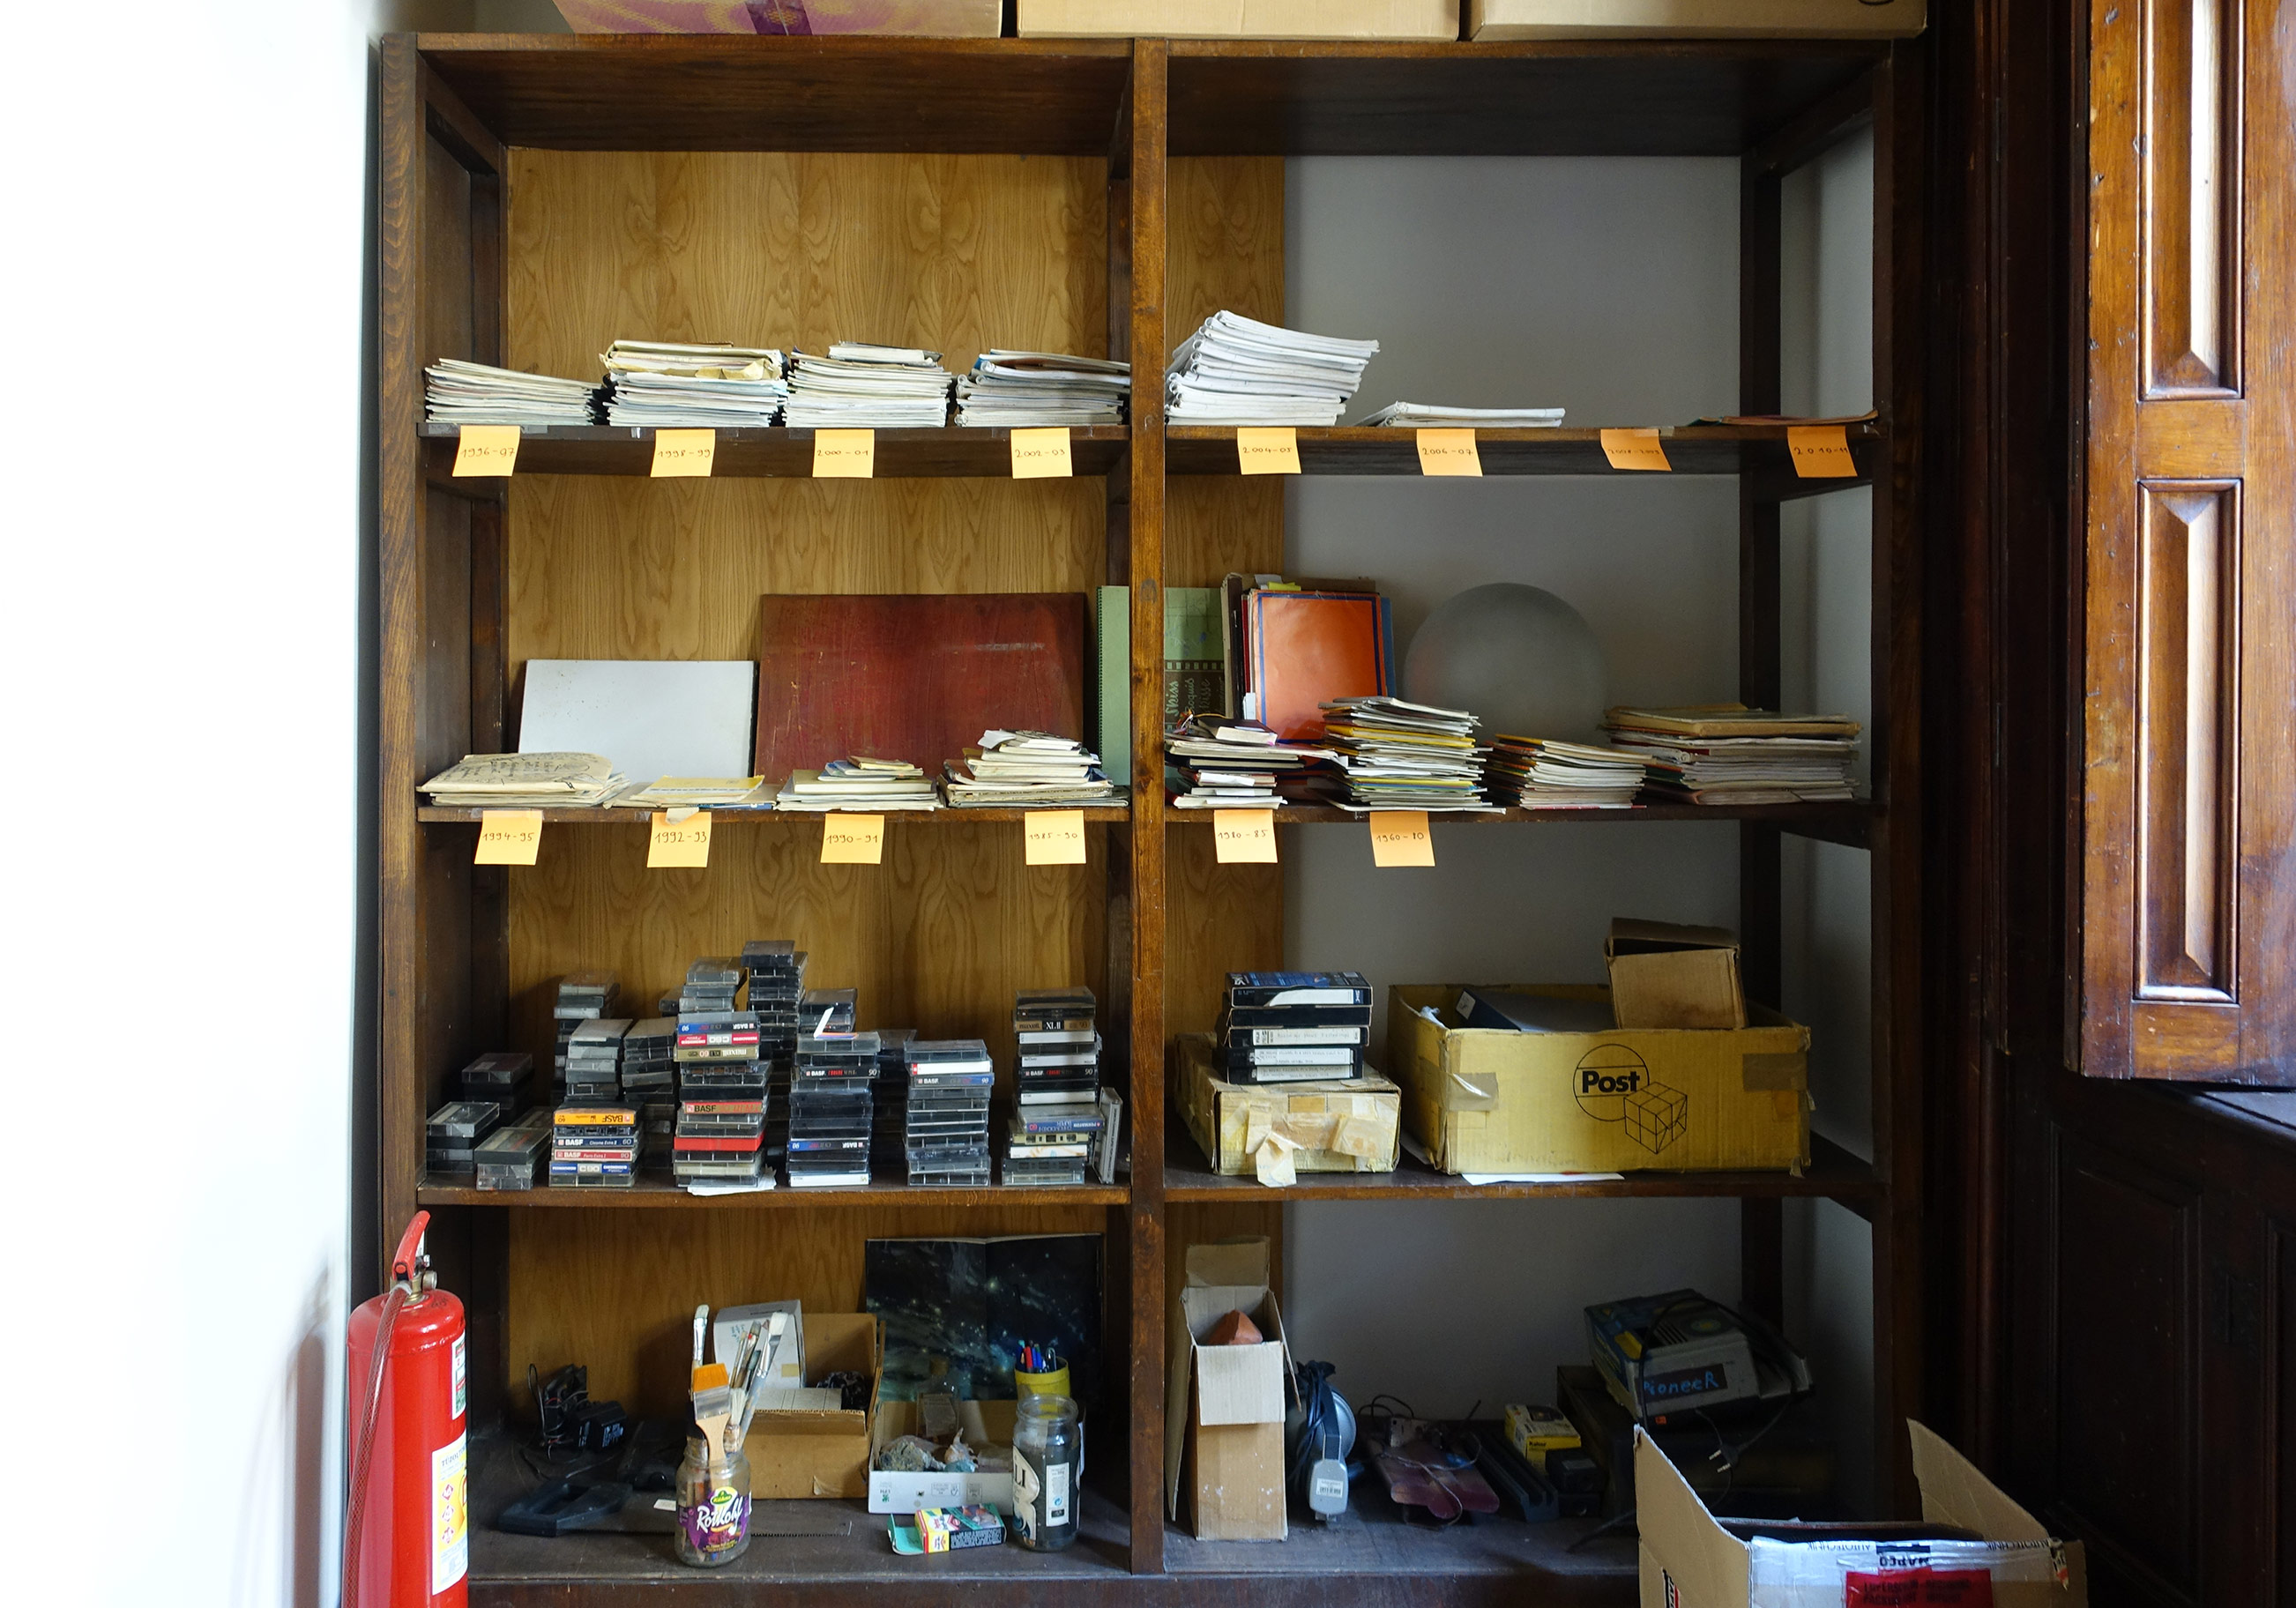 Shelf in the János Baksa Soós Special Collection.